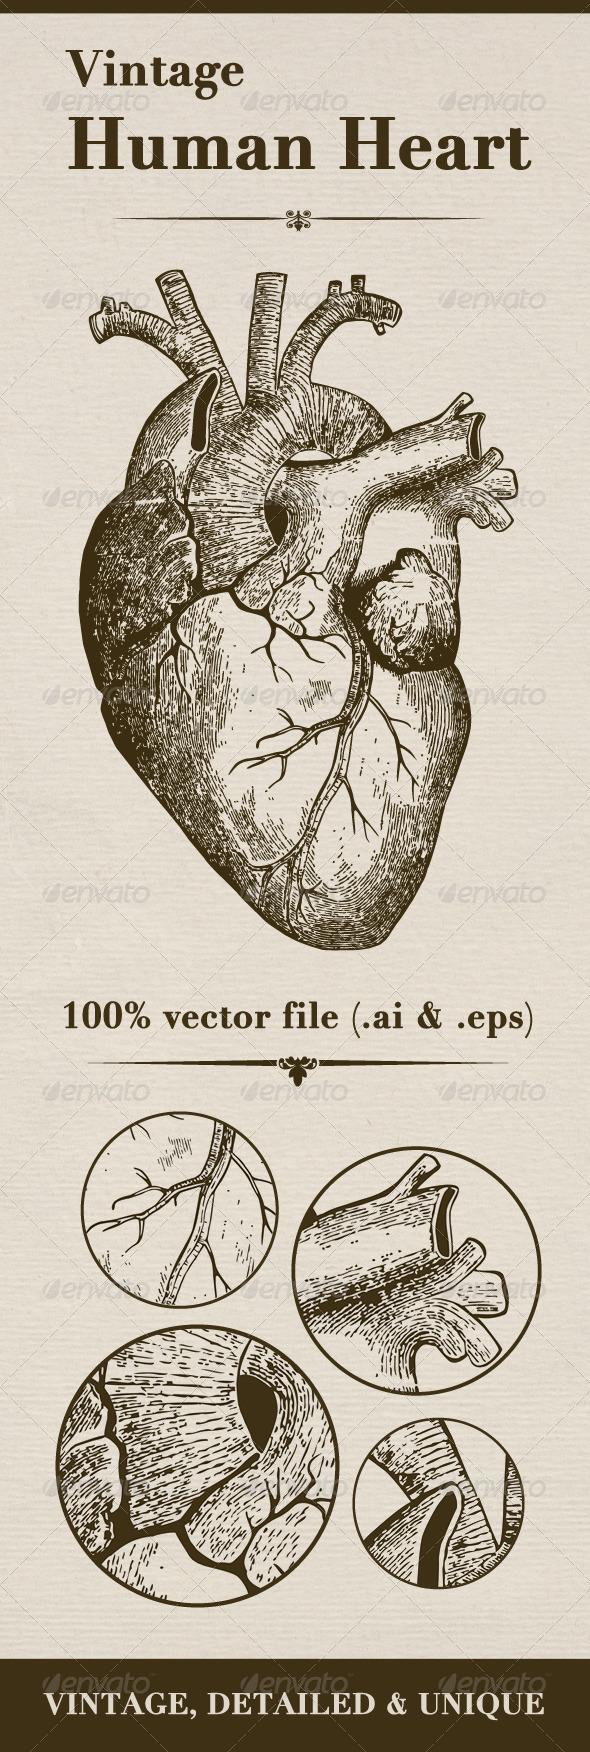 GraphicRiver Vintage Human Heart 6084413